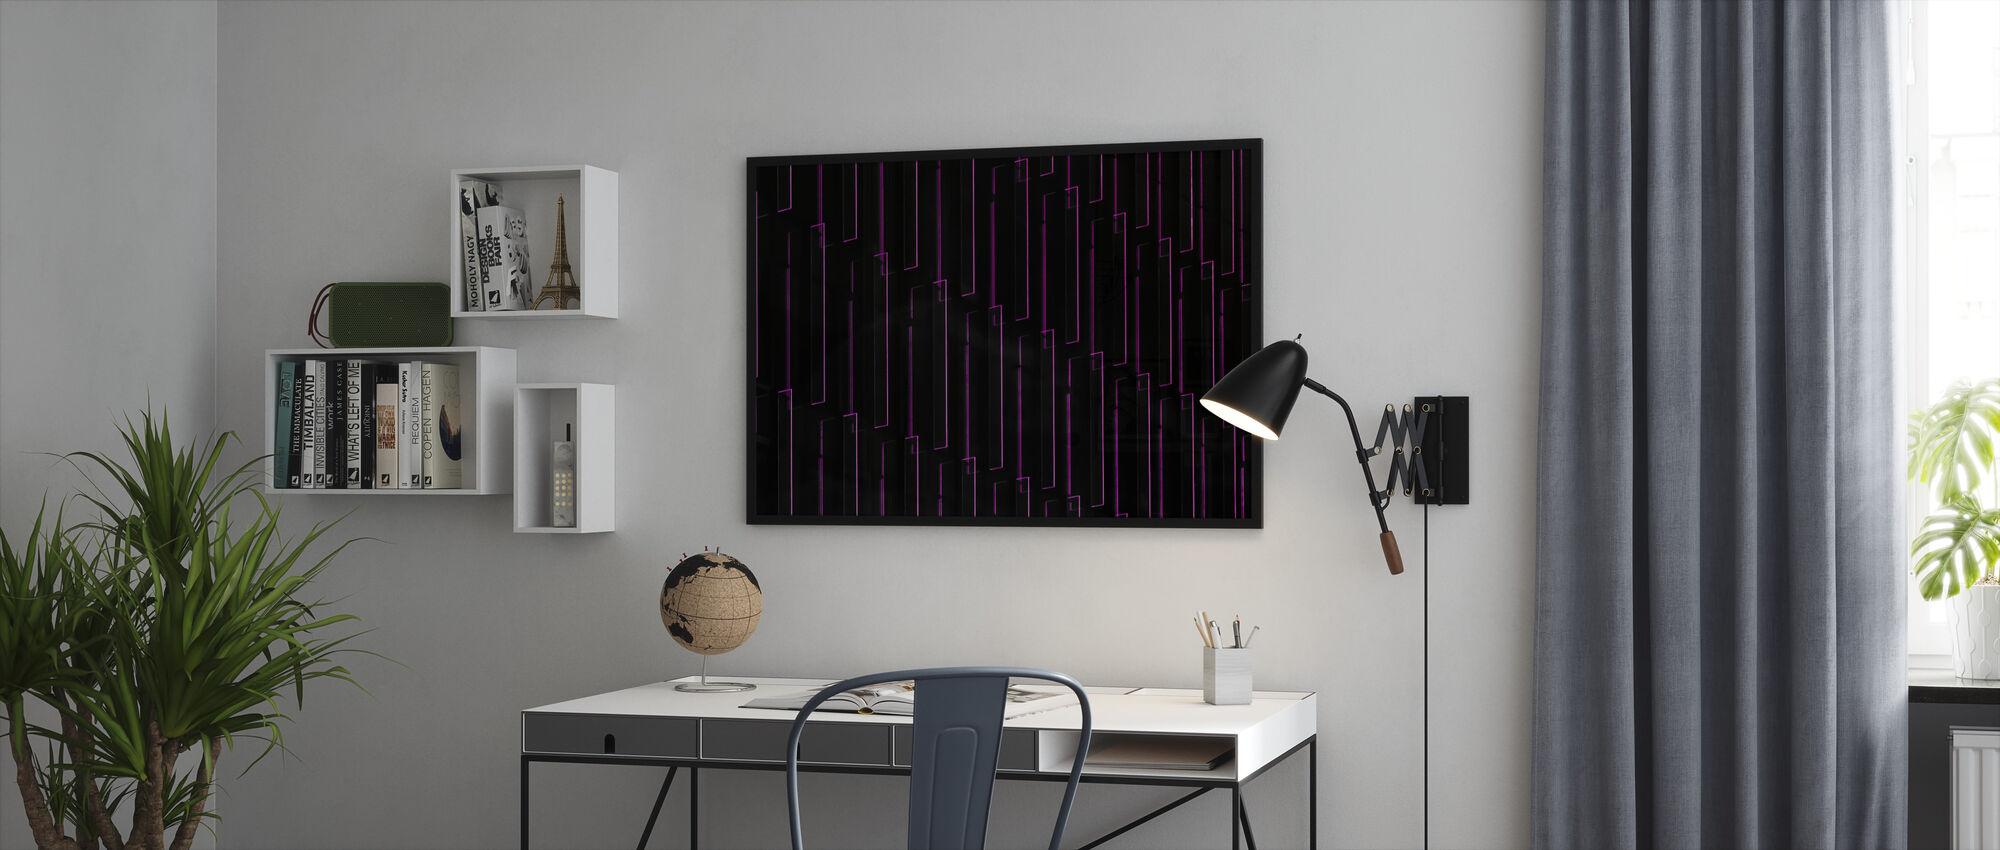 Lilla Neon Lys - Innrammet bilde - Kontor